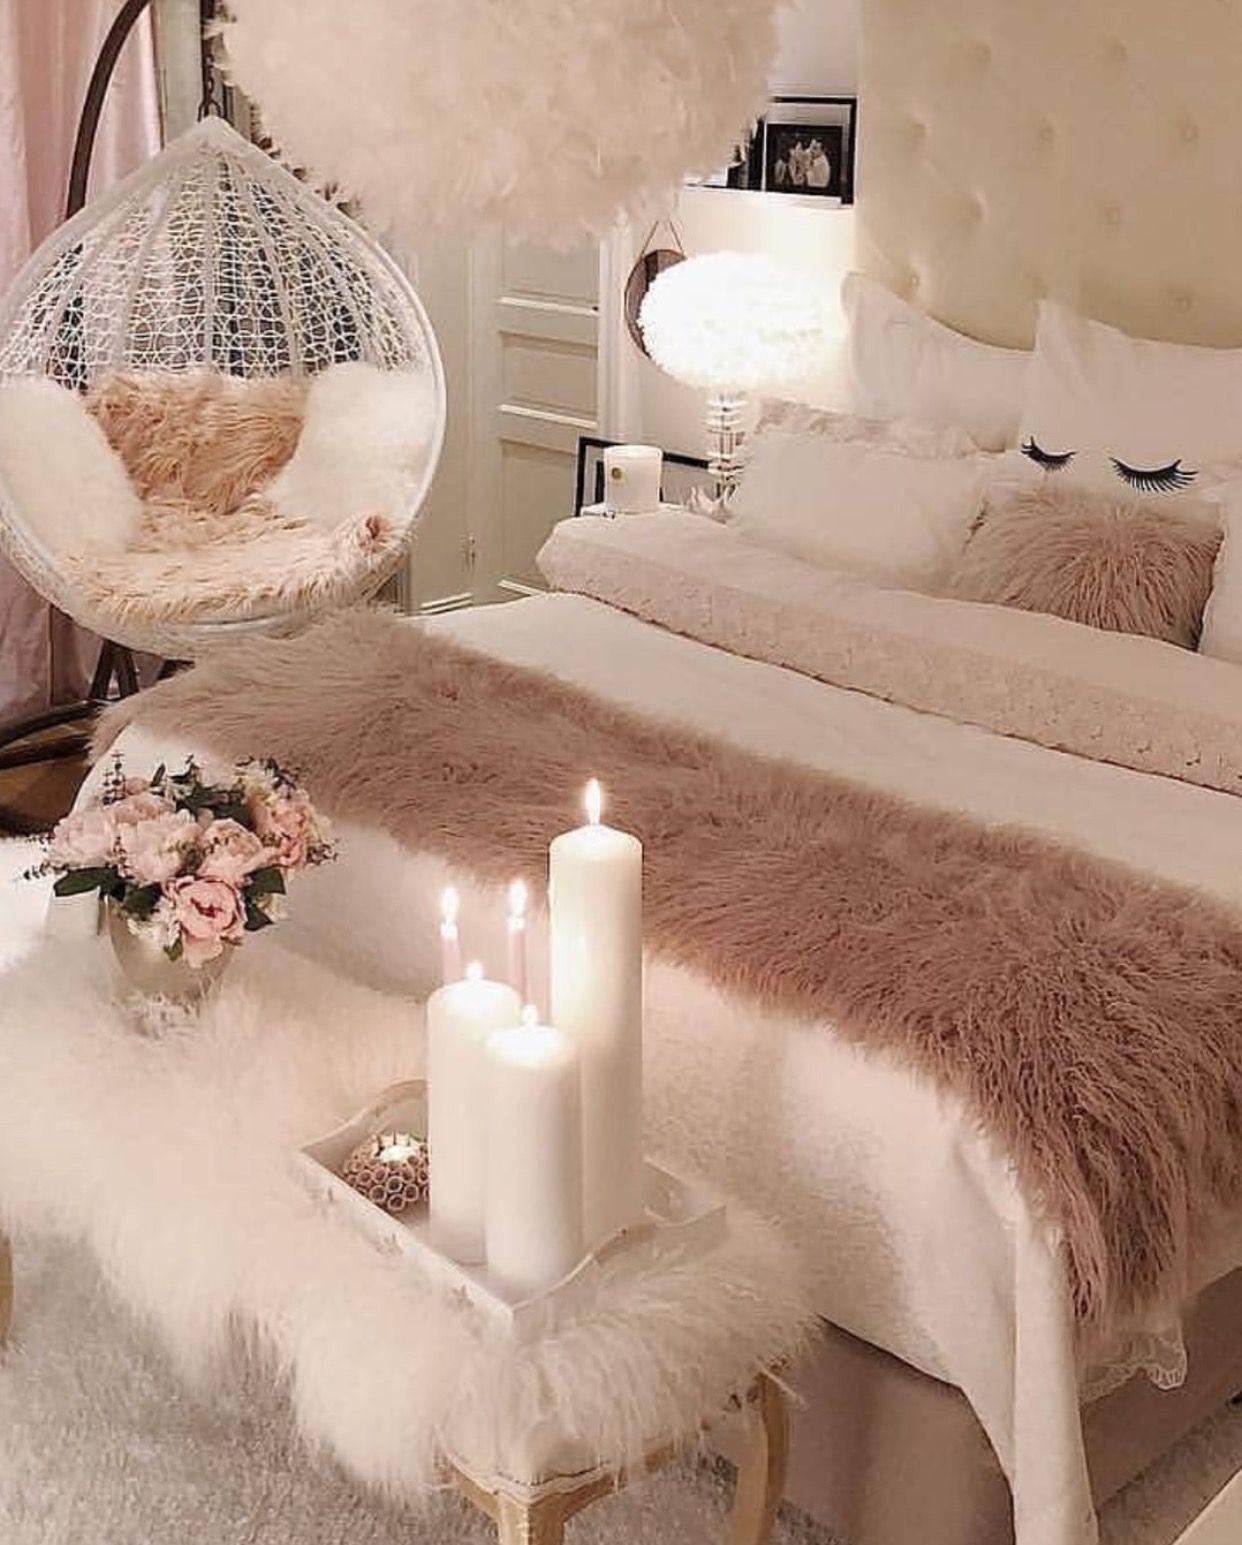 Bedroom Ideas ديكور وتصاميم غرف نوم بنات Just4girls